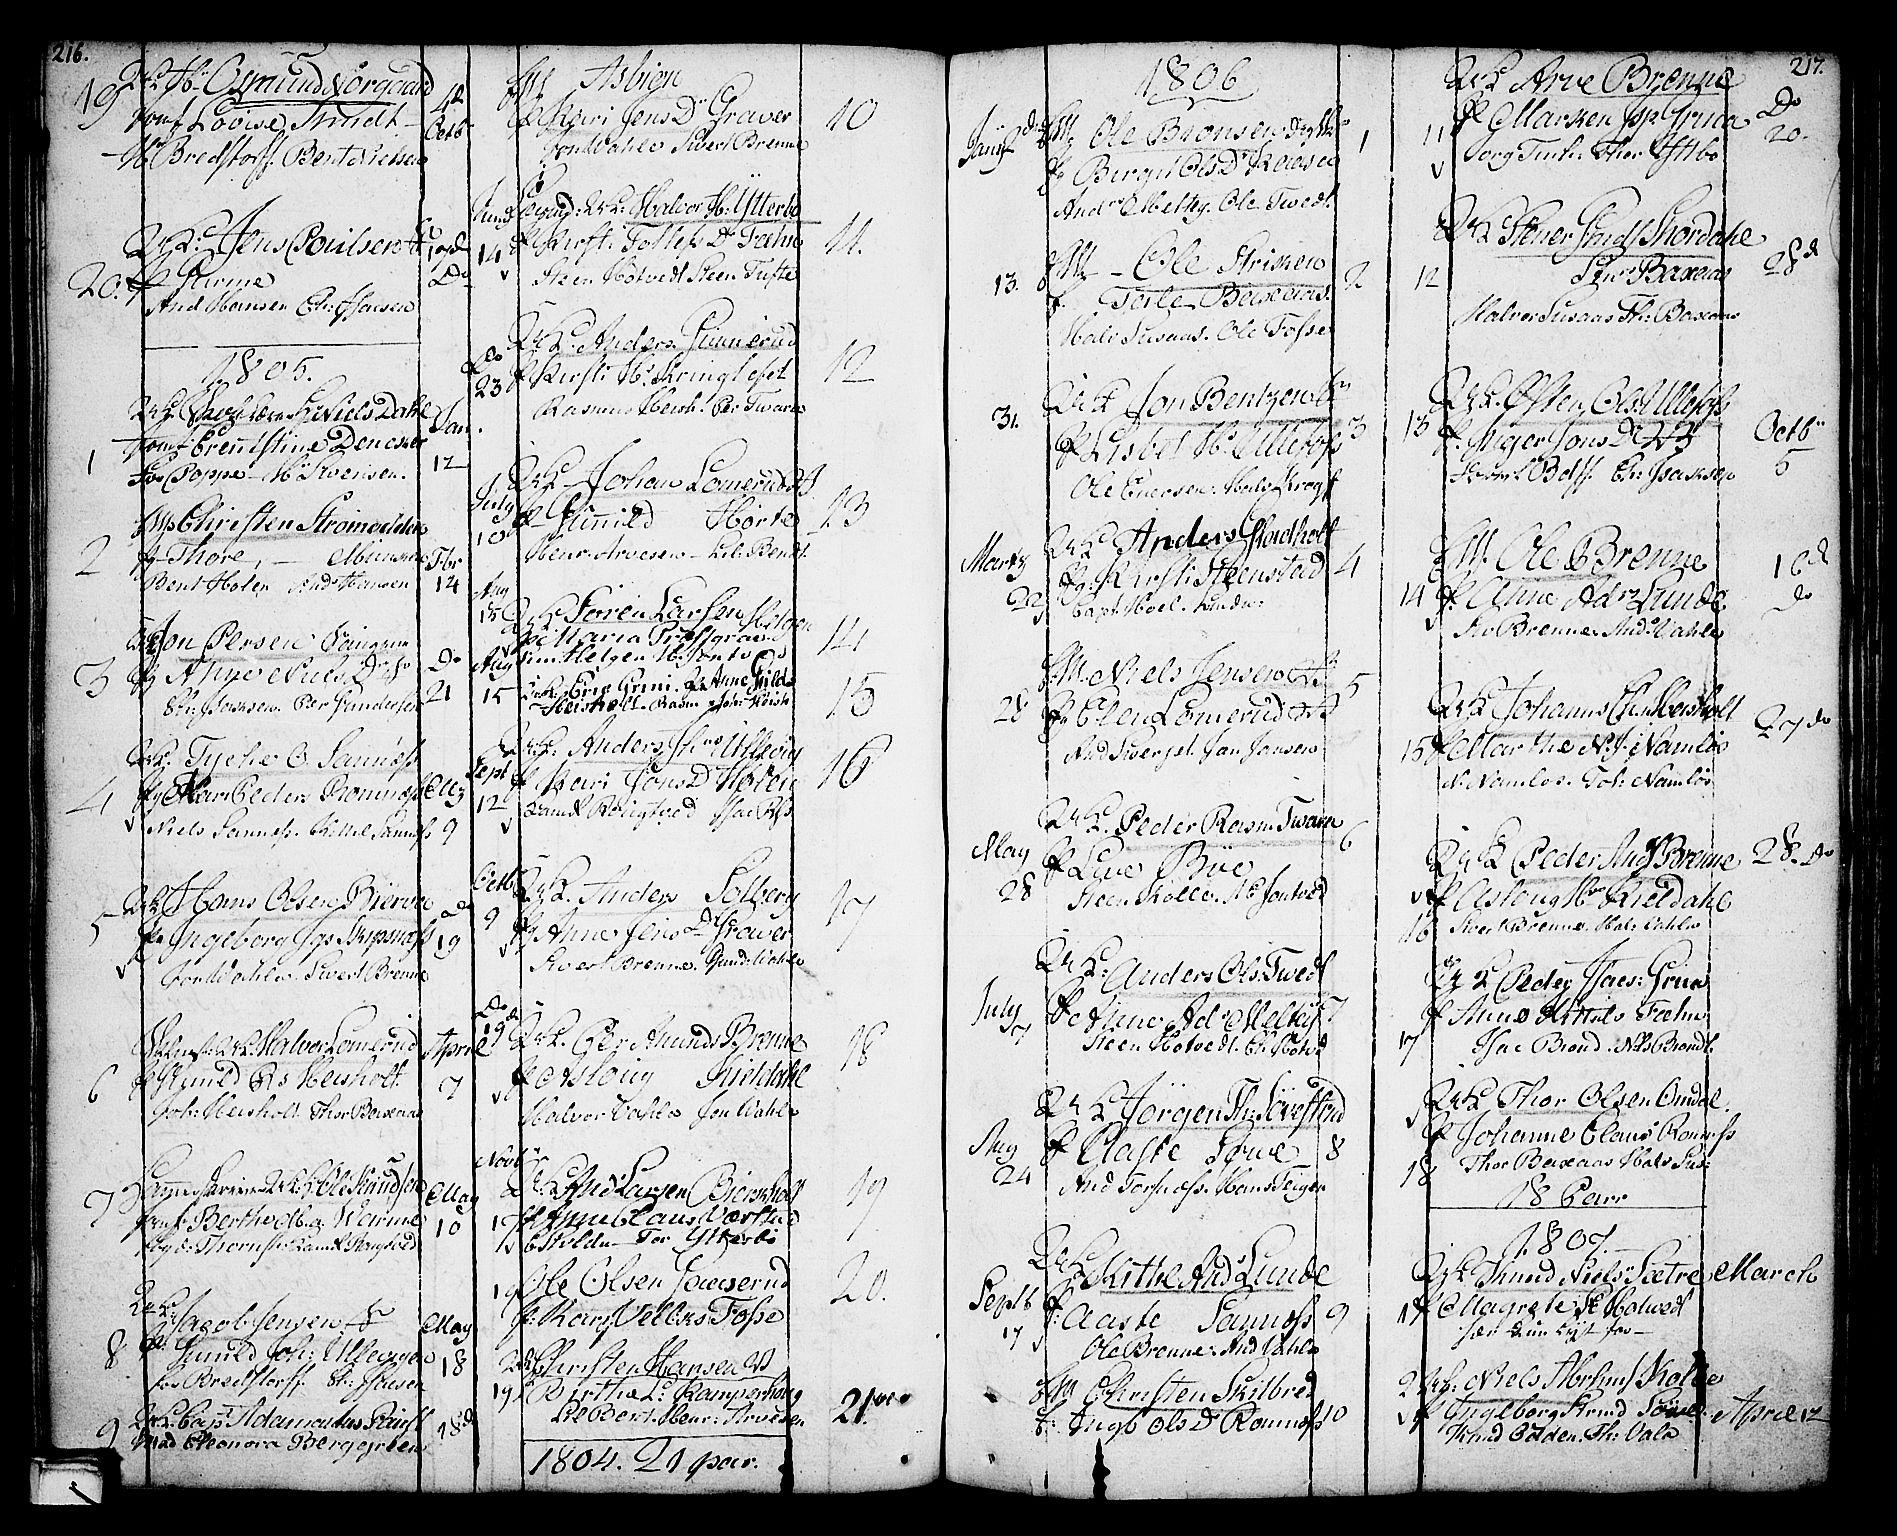 SAKO, Holla kirkebøker, F/Fa/L0002: Ministerialbok nr. 2, 1779-1814, s. 216-217